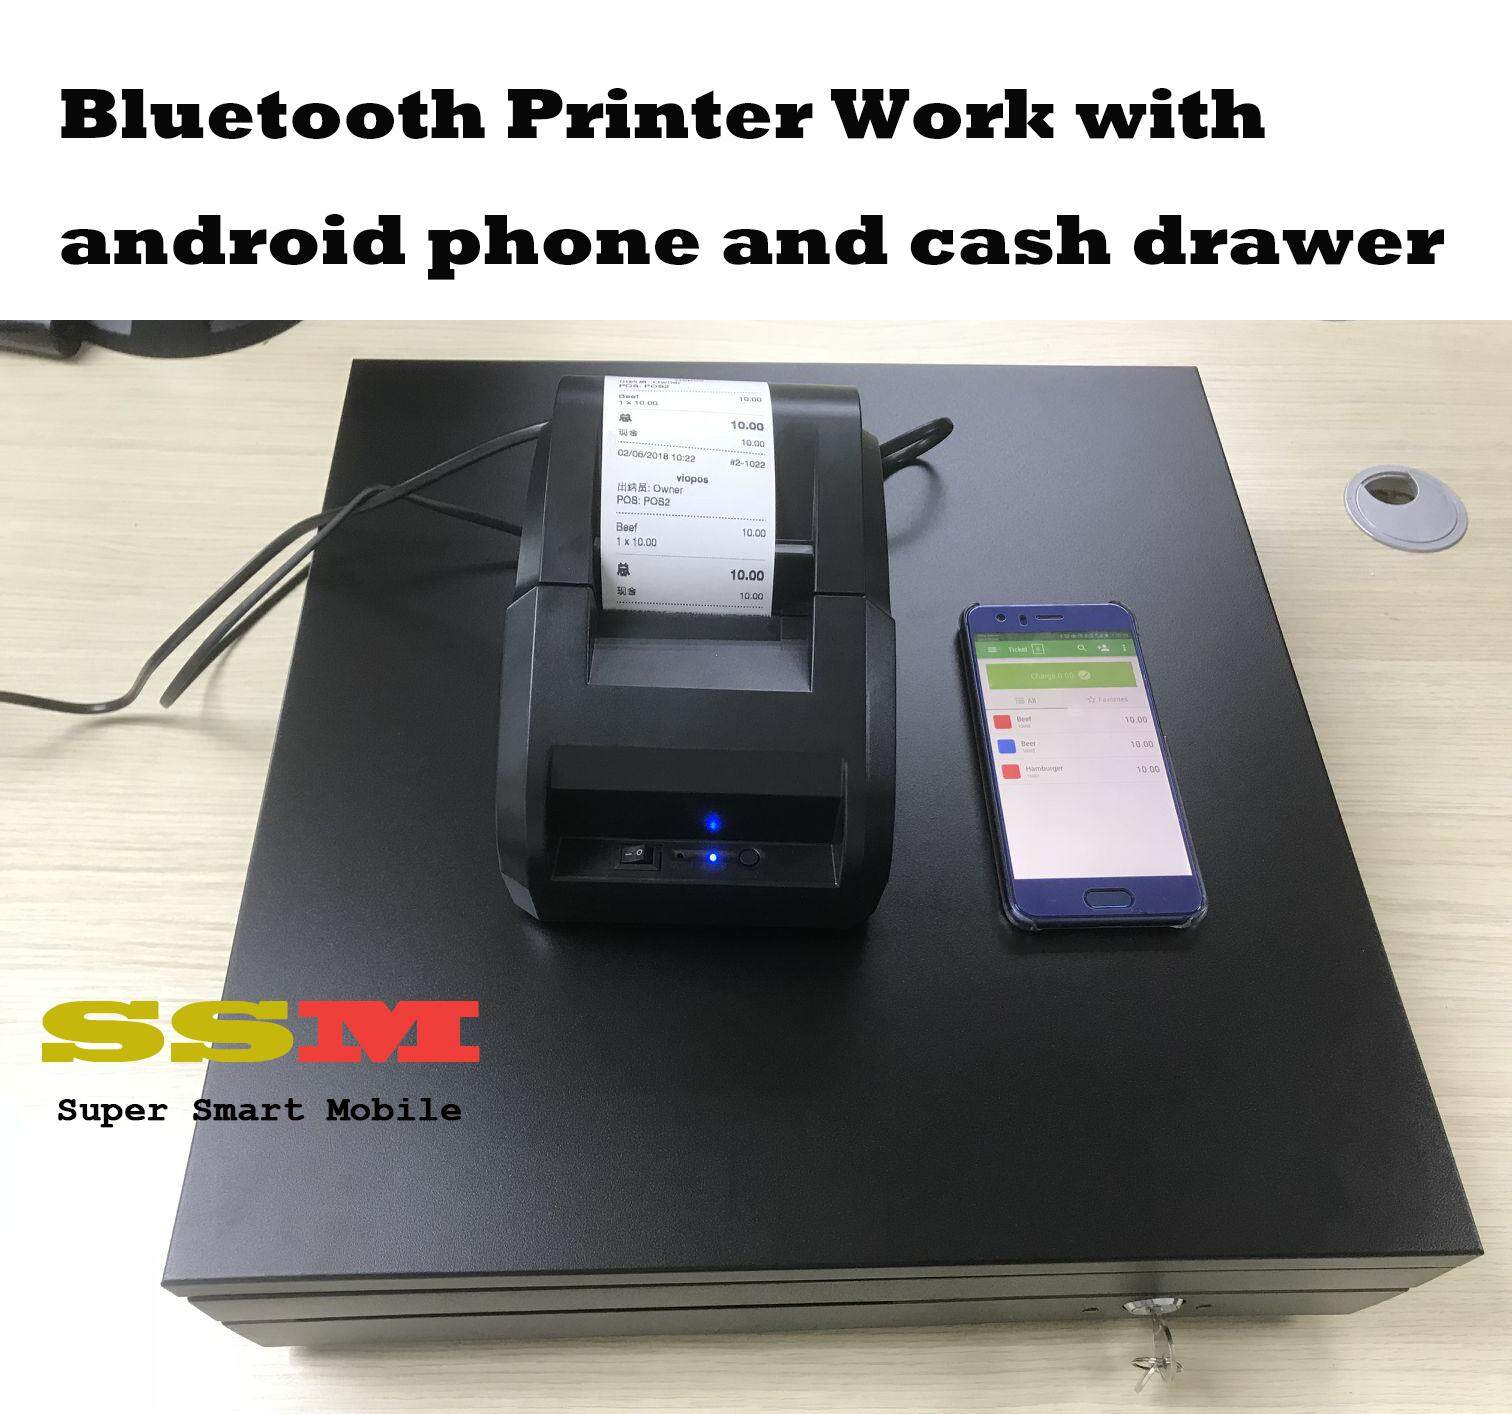 58mm printer with cash drawer.jpg